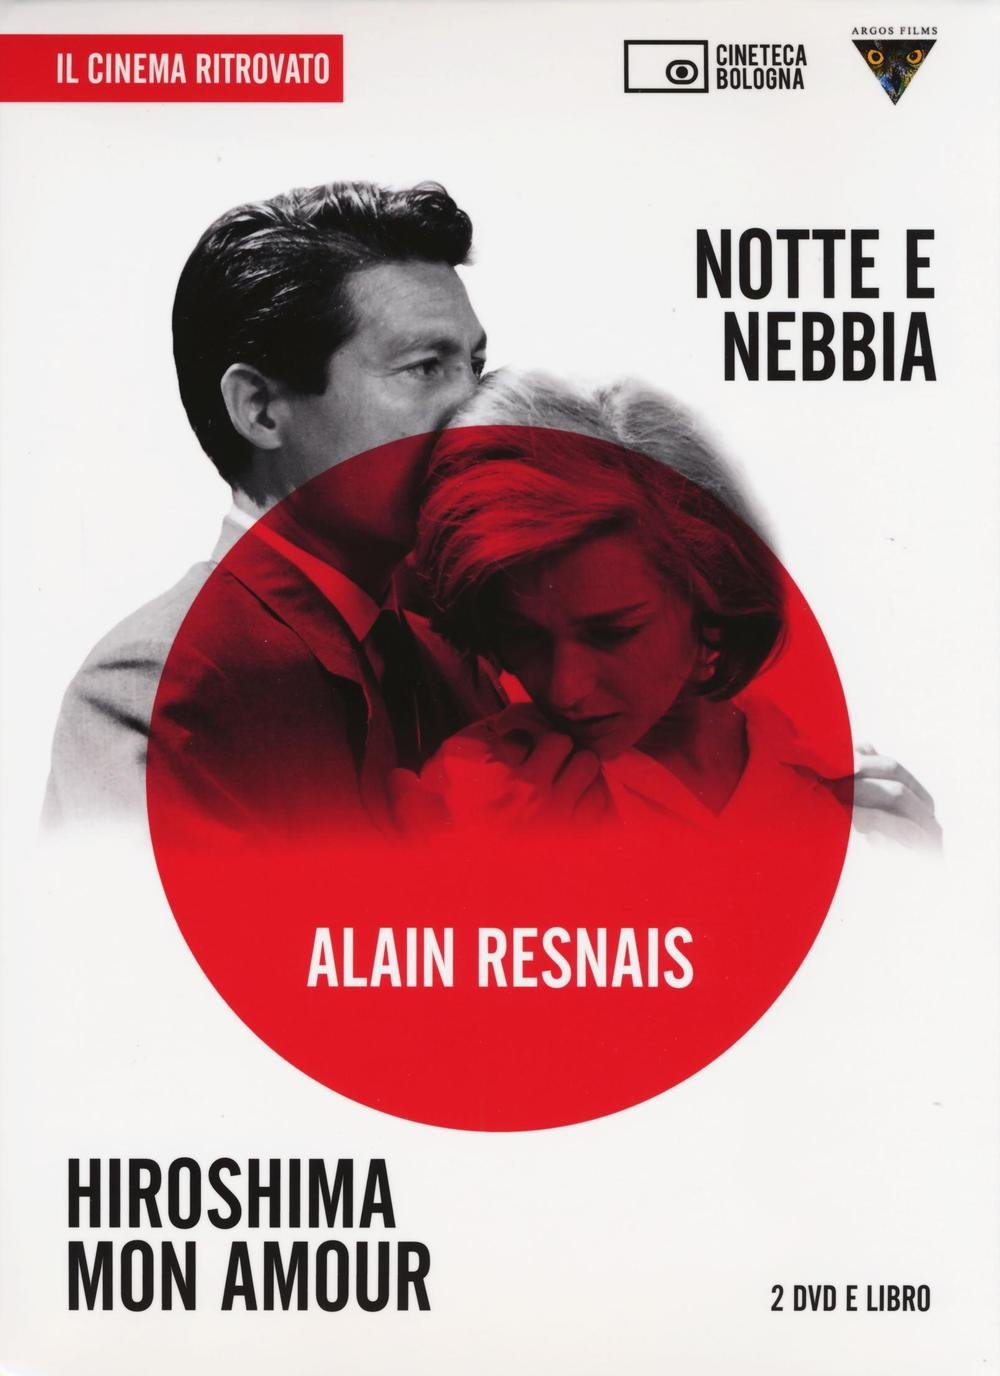 COF.HIROSHIMA MON AMOUR / NOTTE E NEBBIA (2 DVD+LIBRO) (DVD)